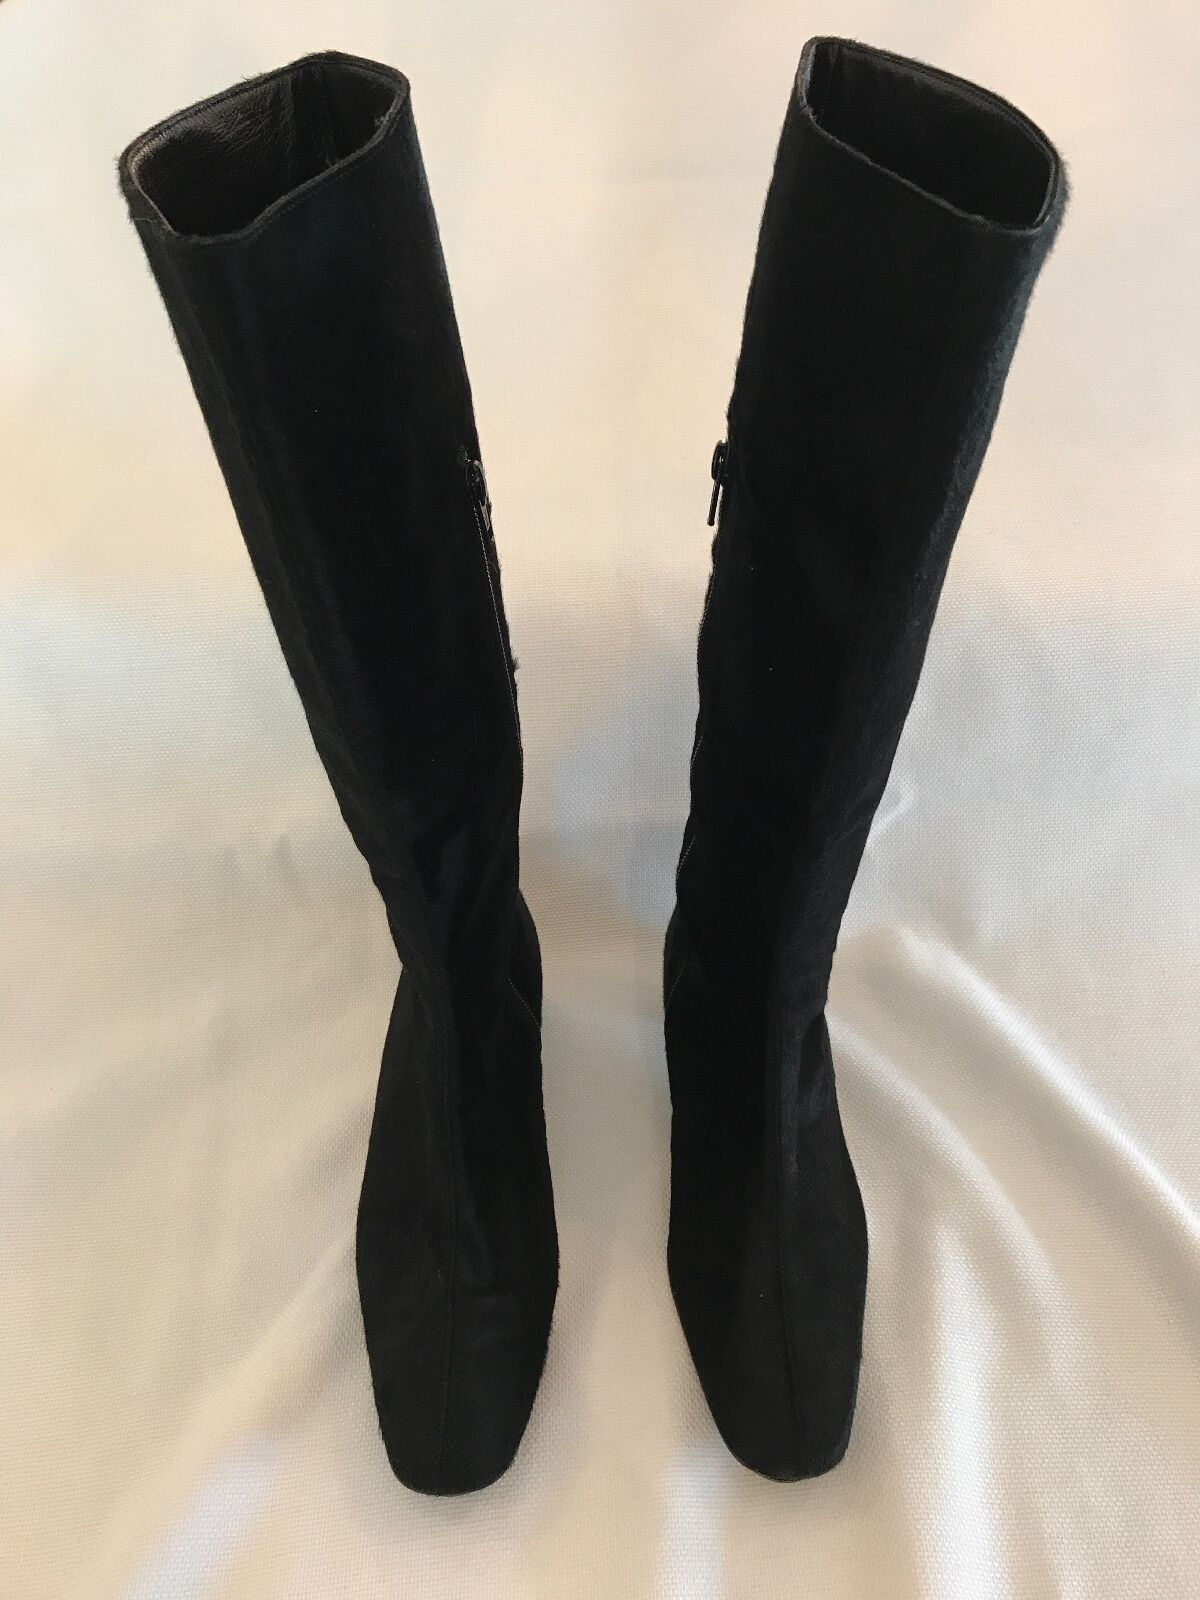 L. K. BENNETT Calf Hair Black Boots, Women's Size 6, Hardly Worn, Gorgeous!